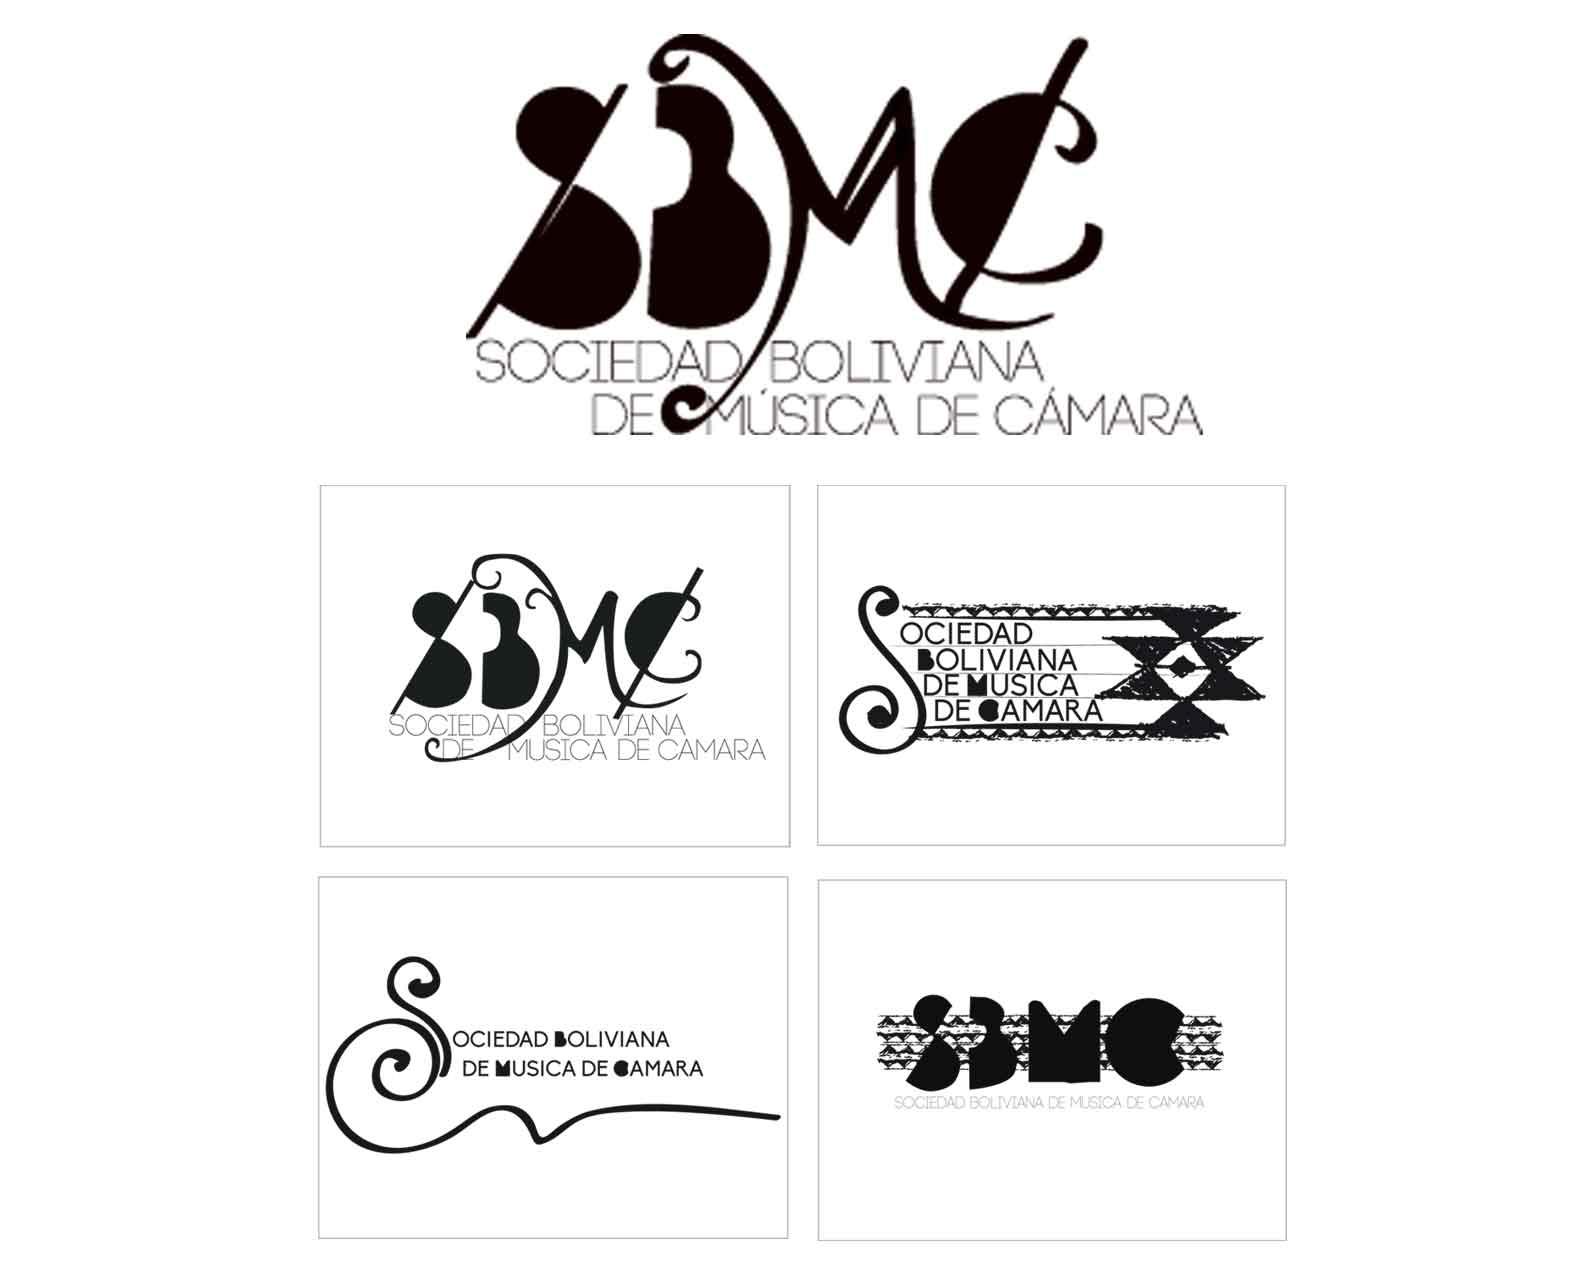 Logo for Sociedad Boliviana de Música de Cámara, Bolivian Chamber Music Society